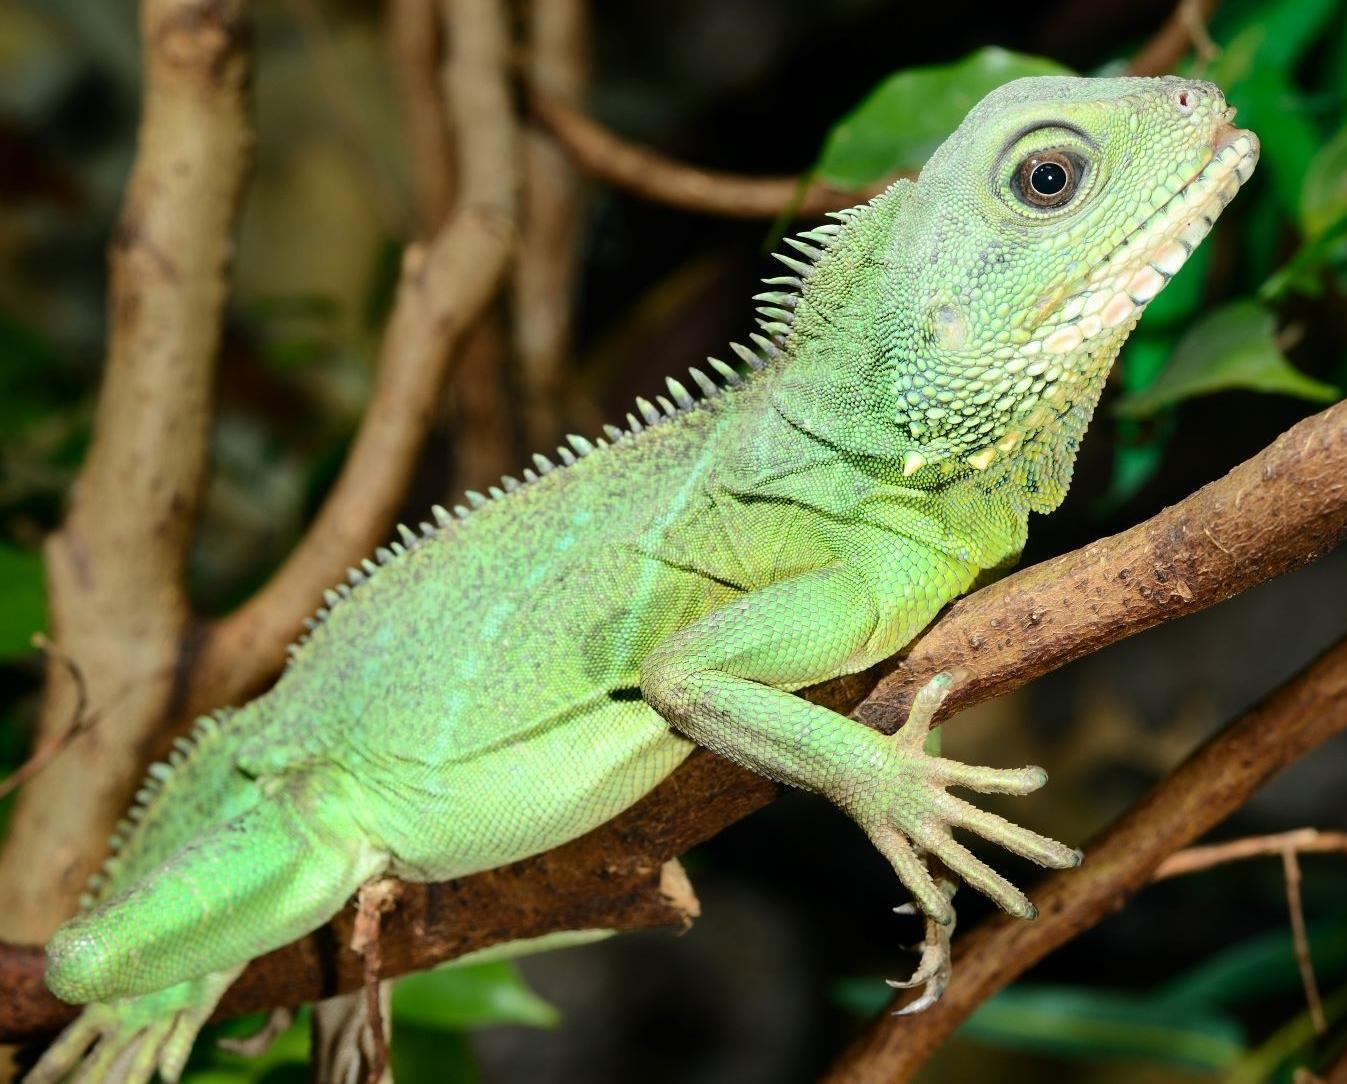 AS-03282016-reptiles-DSC_1682